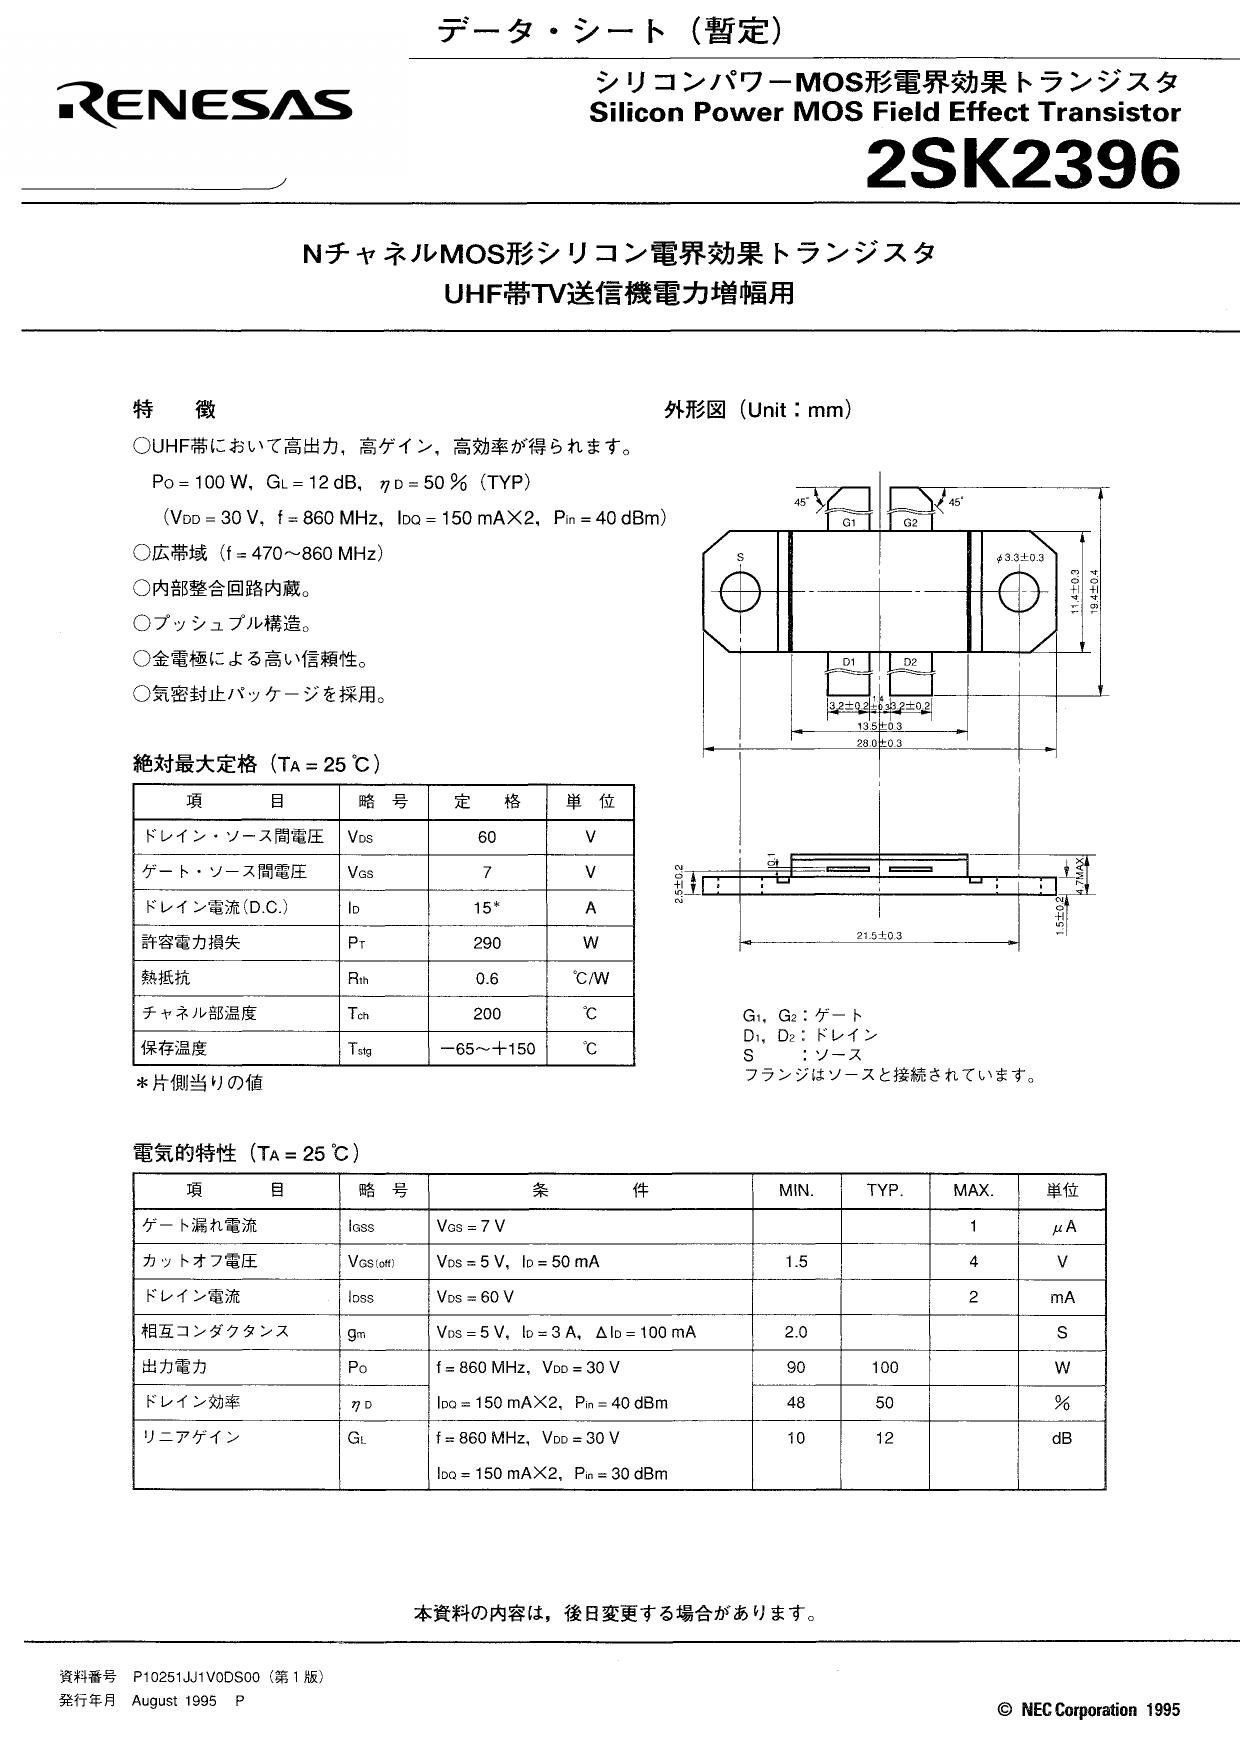 2SK2396 datasheet